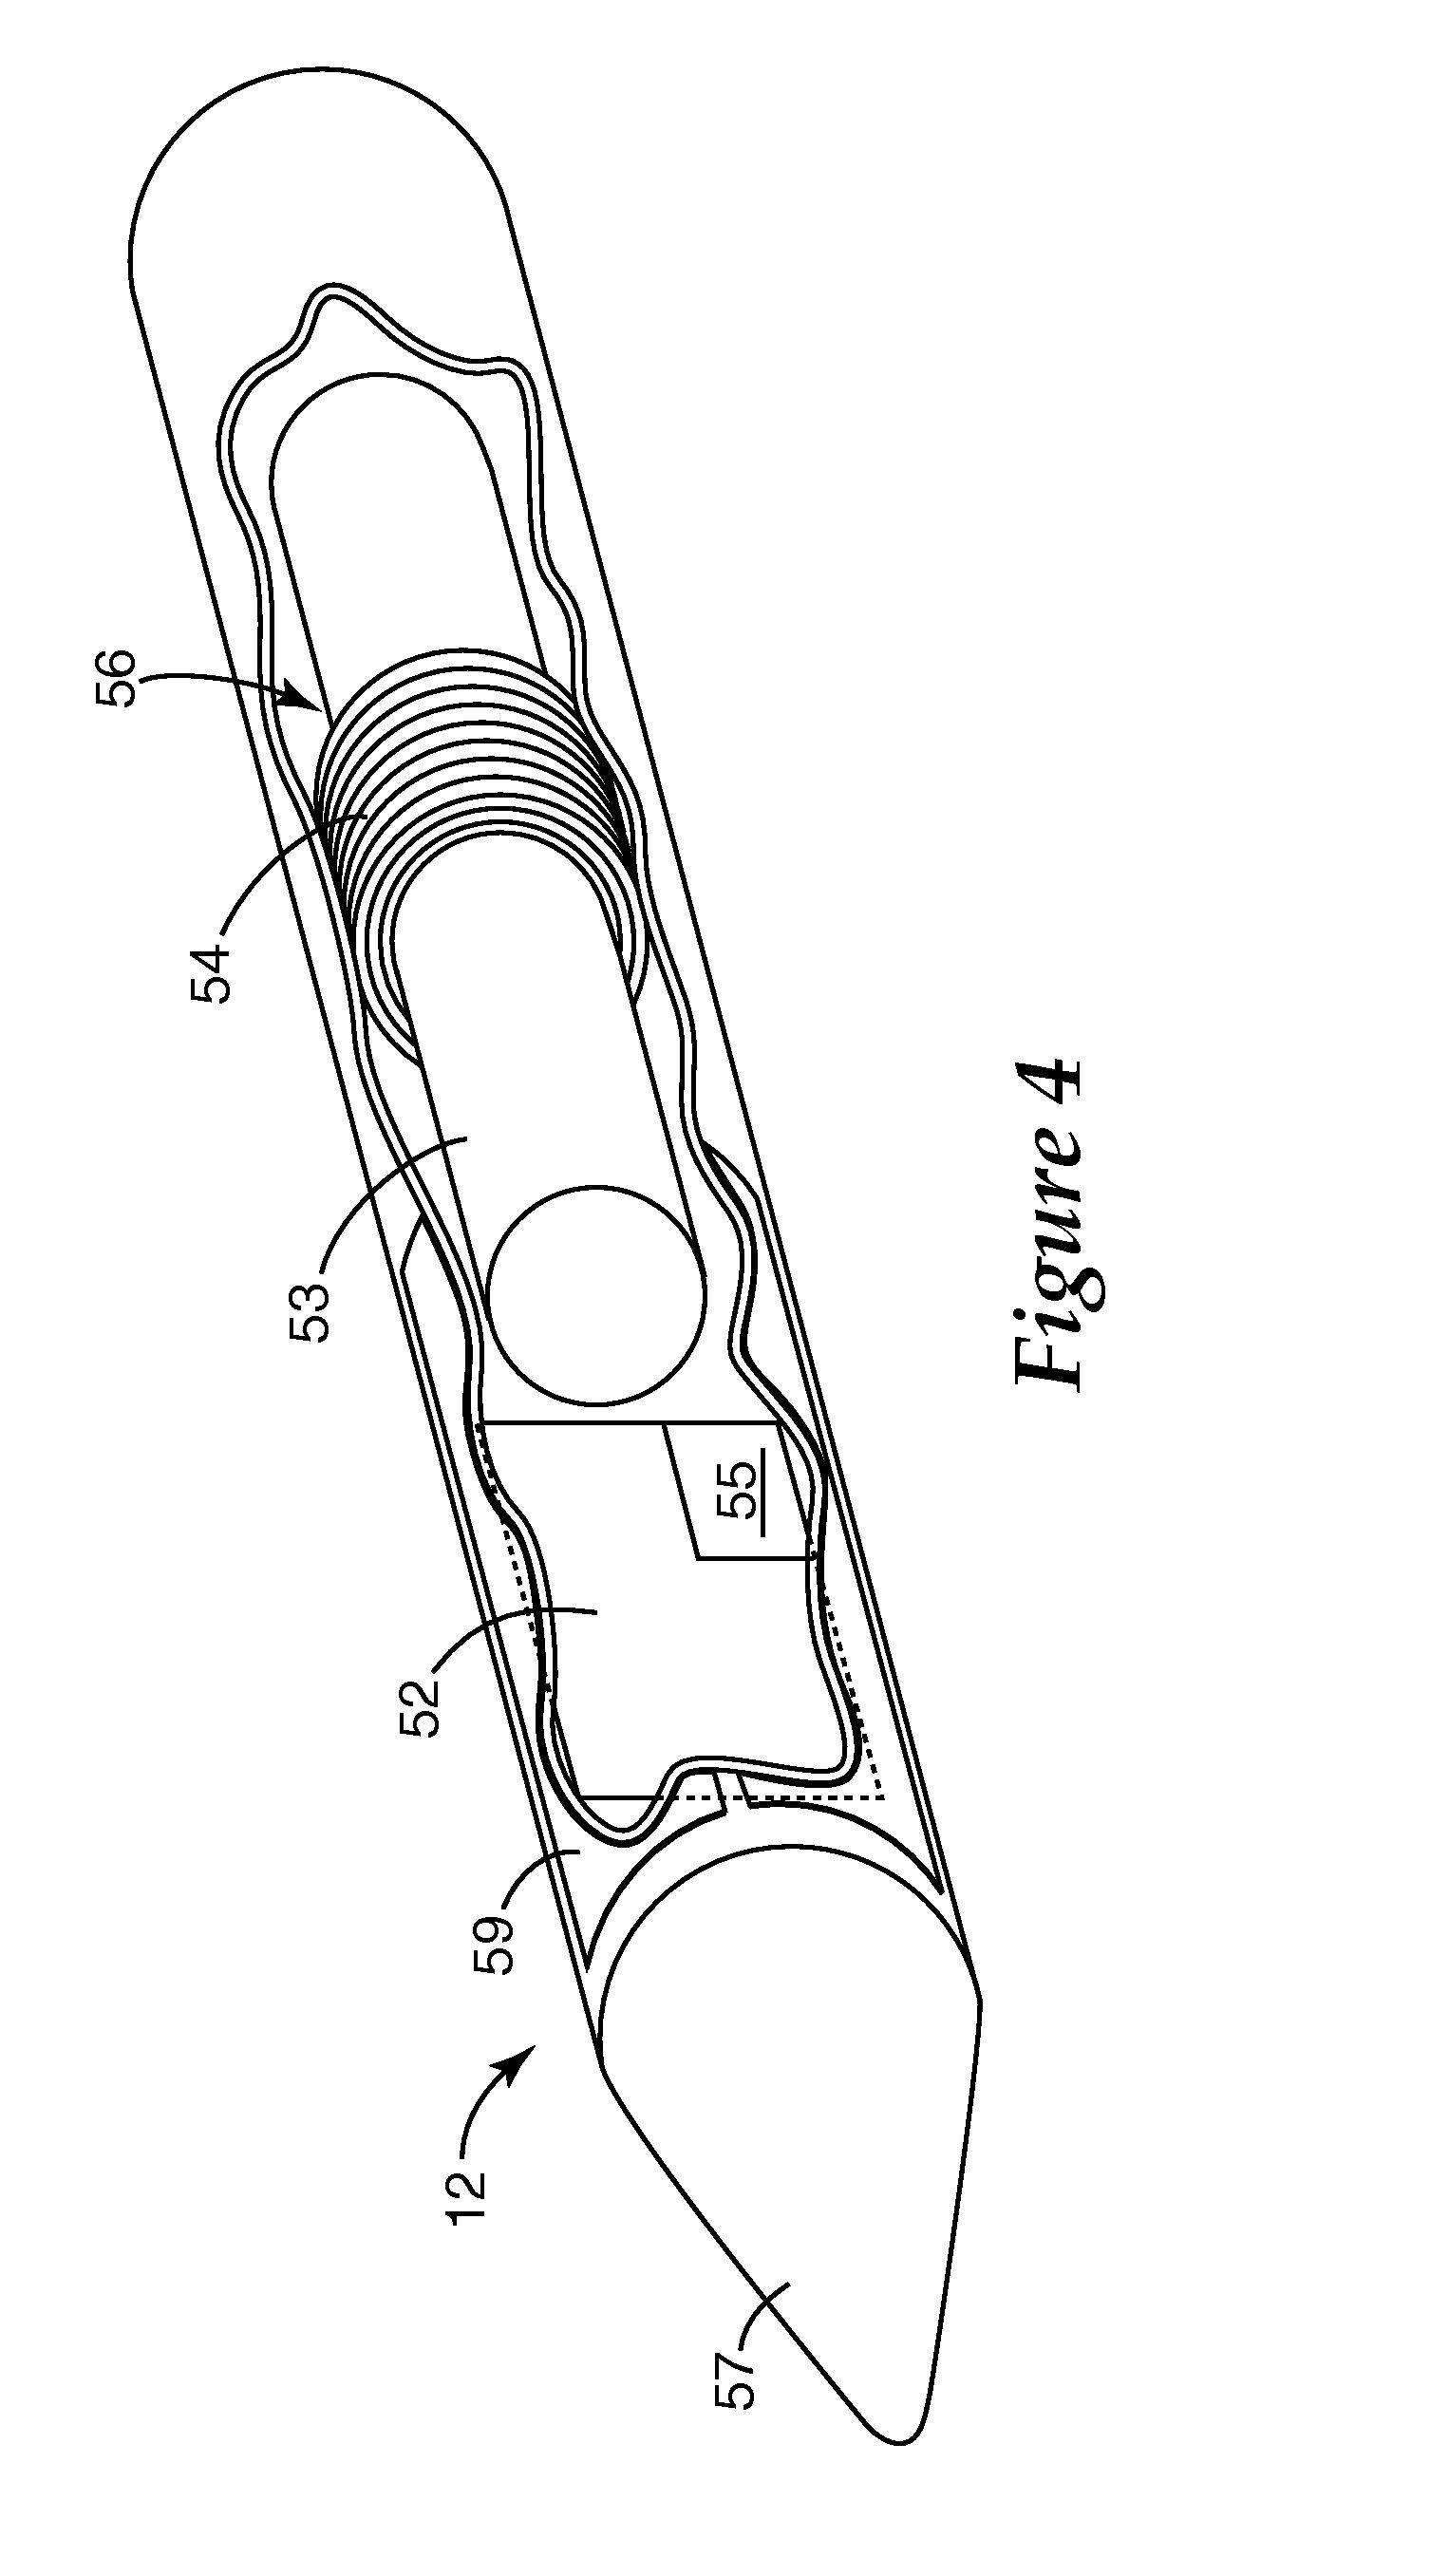 Epiphone Les Paul Coil Tap Wiring Diagram